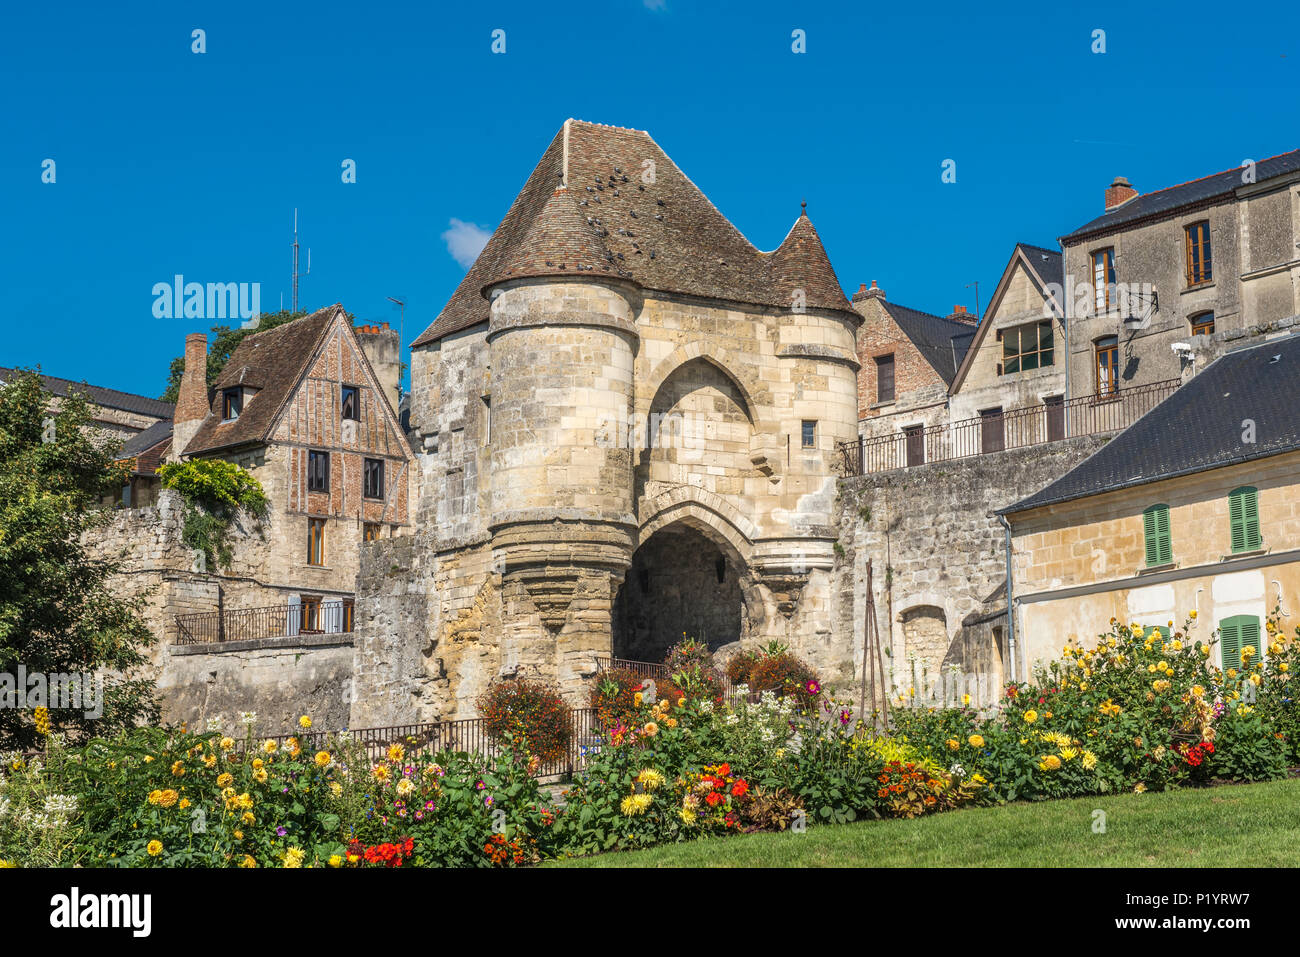 Francia Aisne Laon Ciudad De Arte E Historia Camino De Santiago